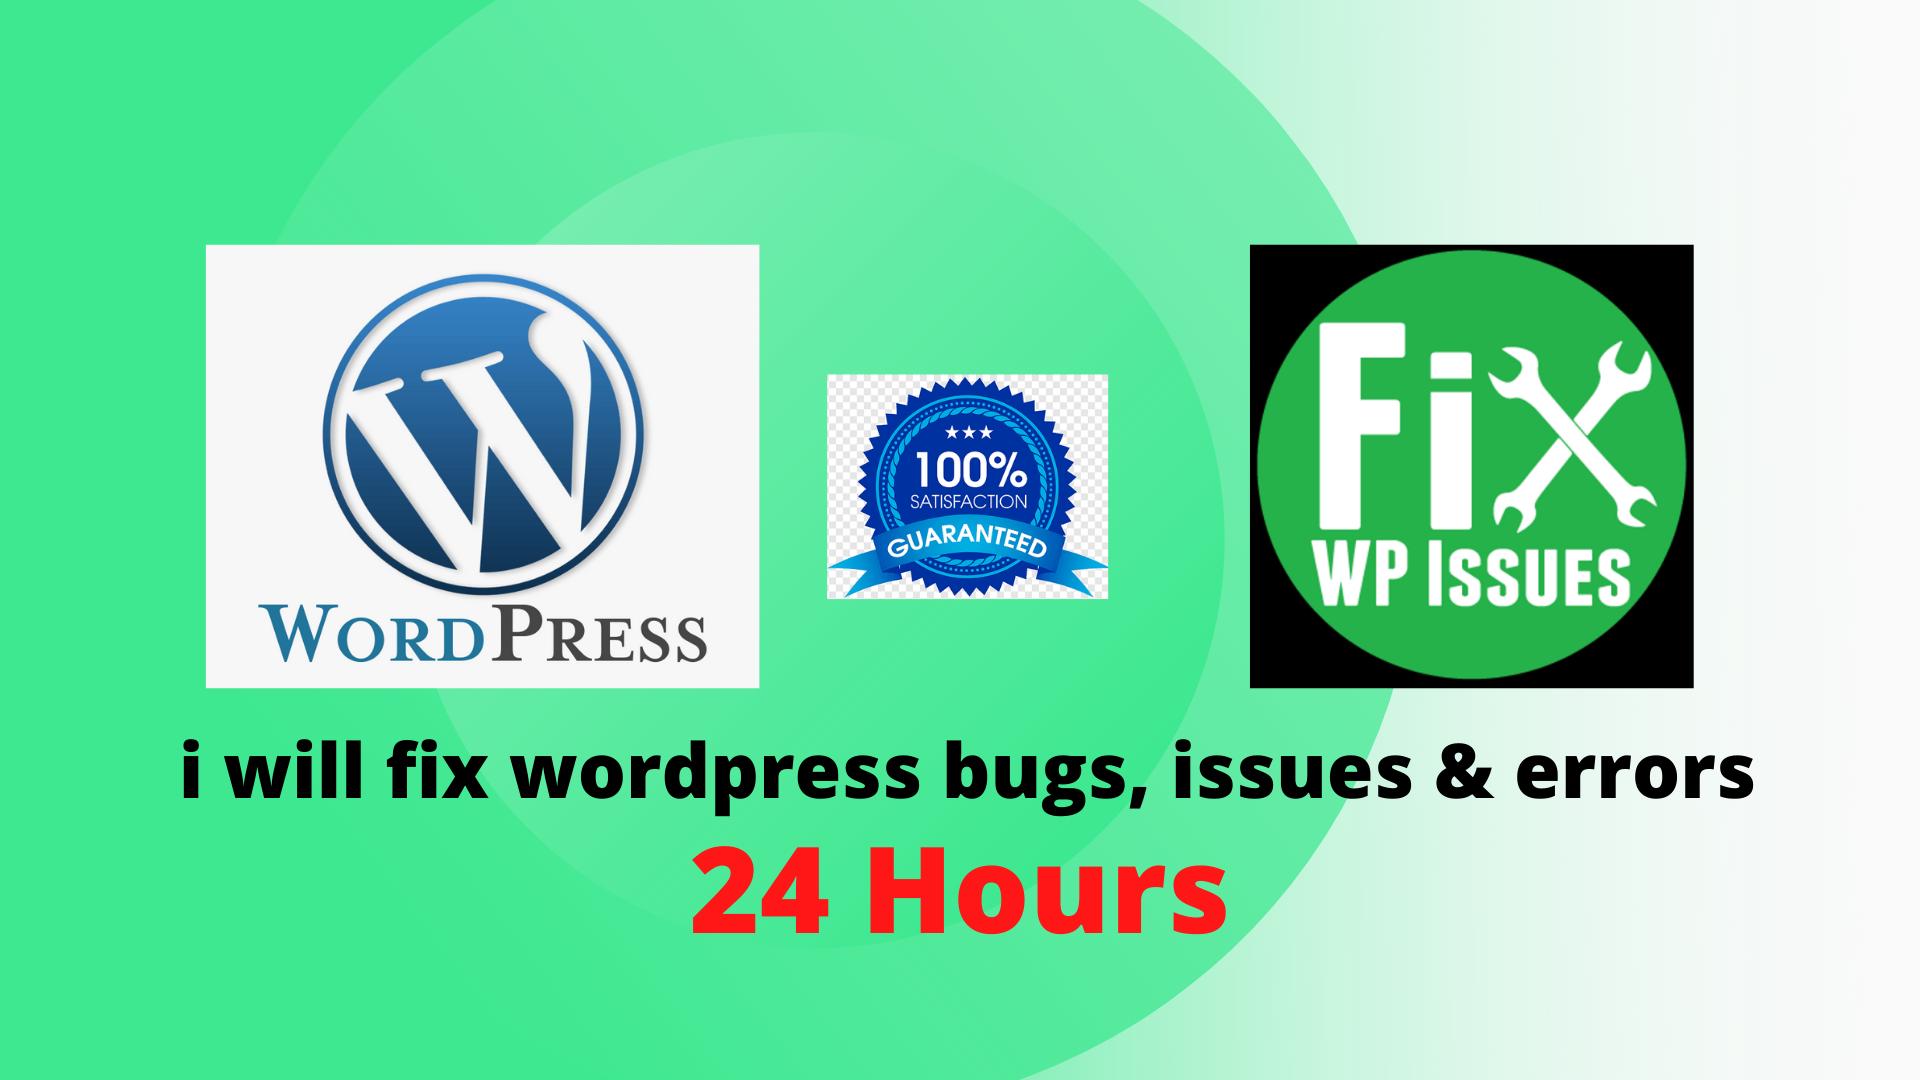 I will fix WordPress issues errors and bugs